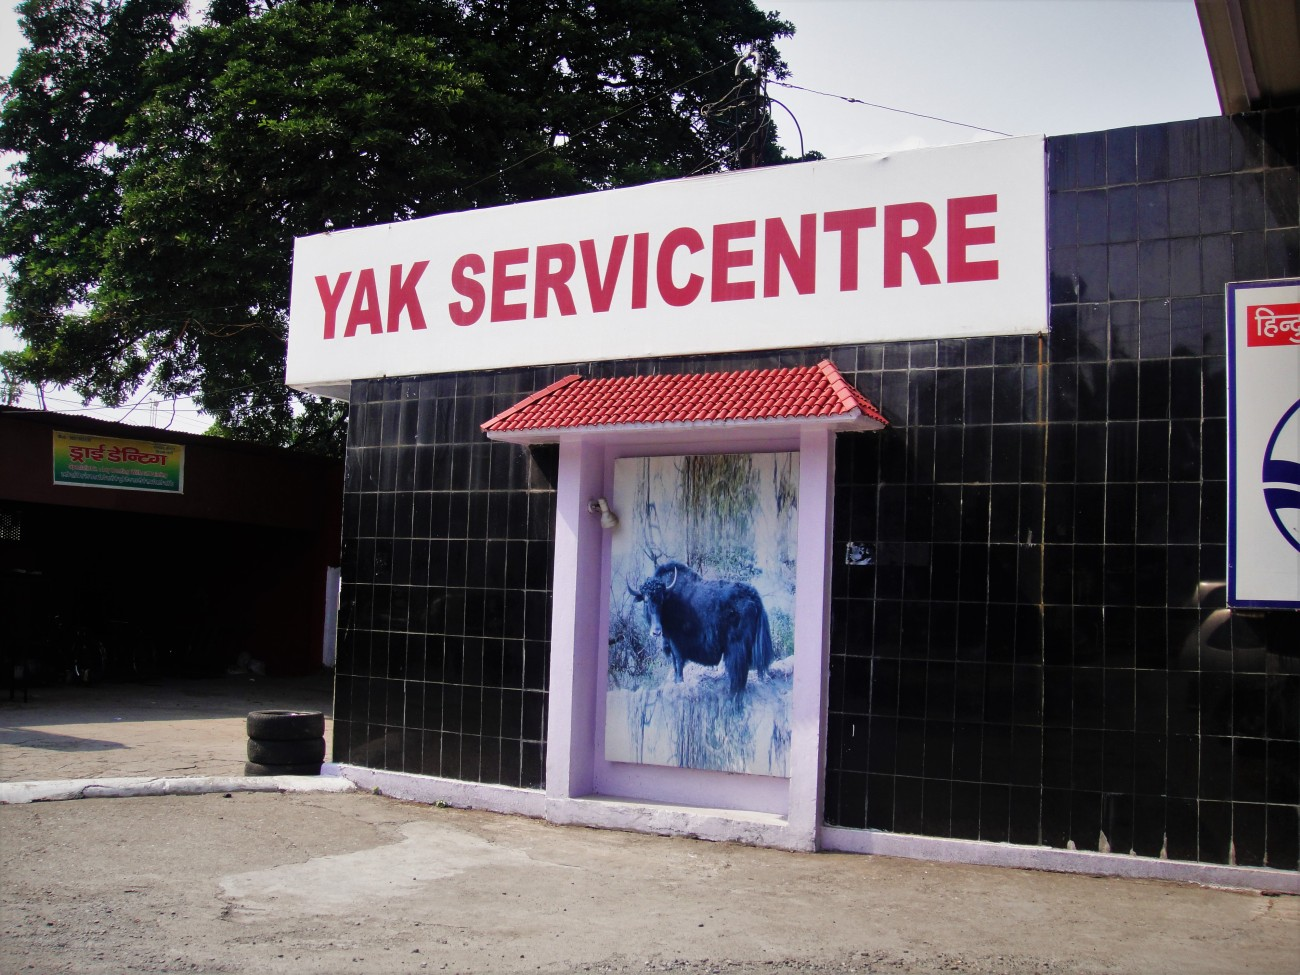 Get Yer Yaks Serviced